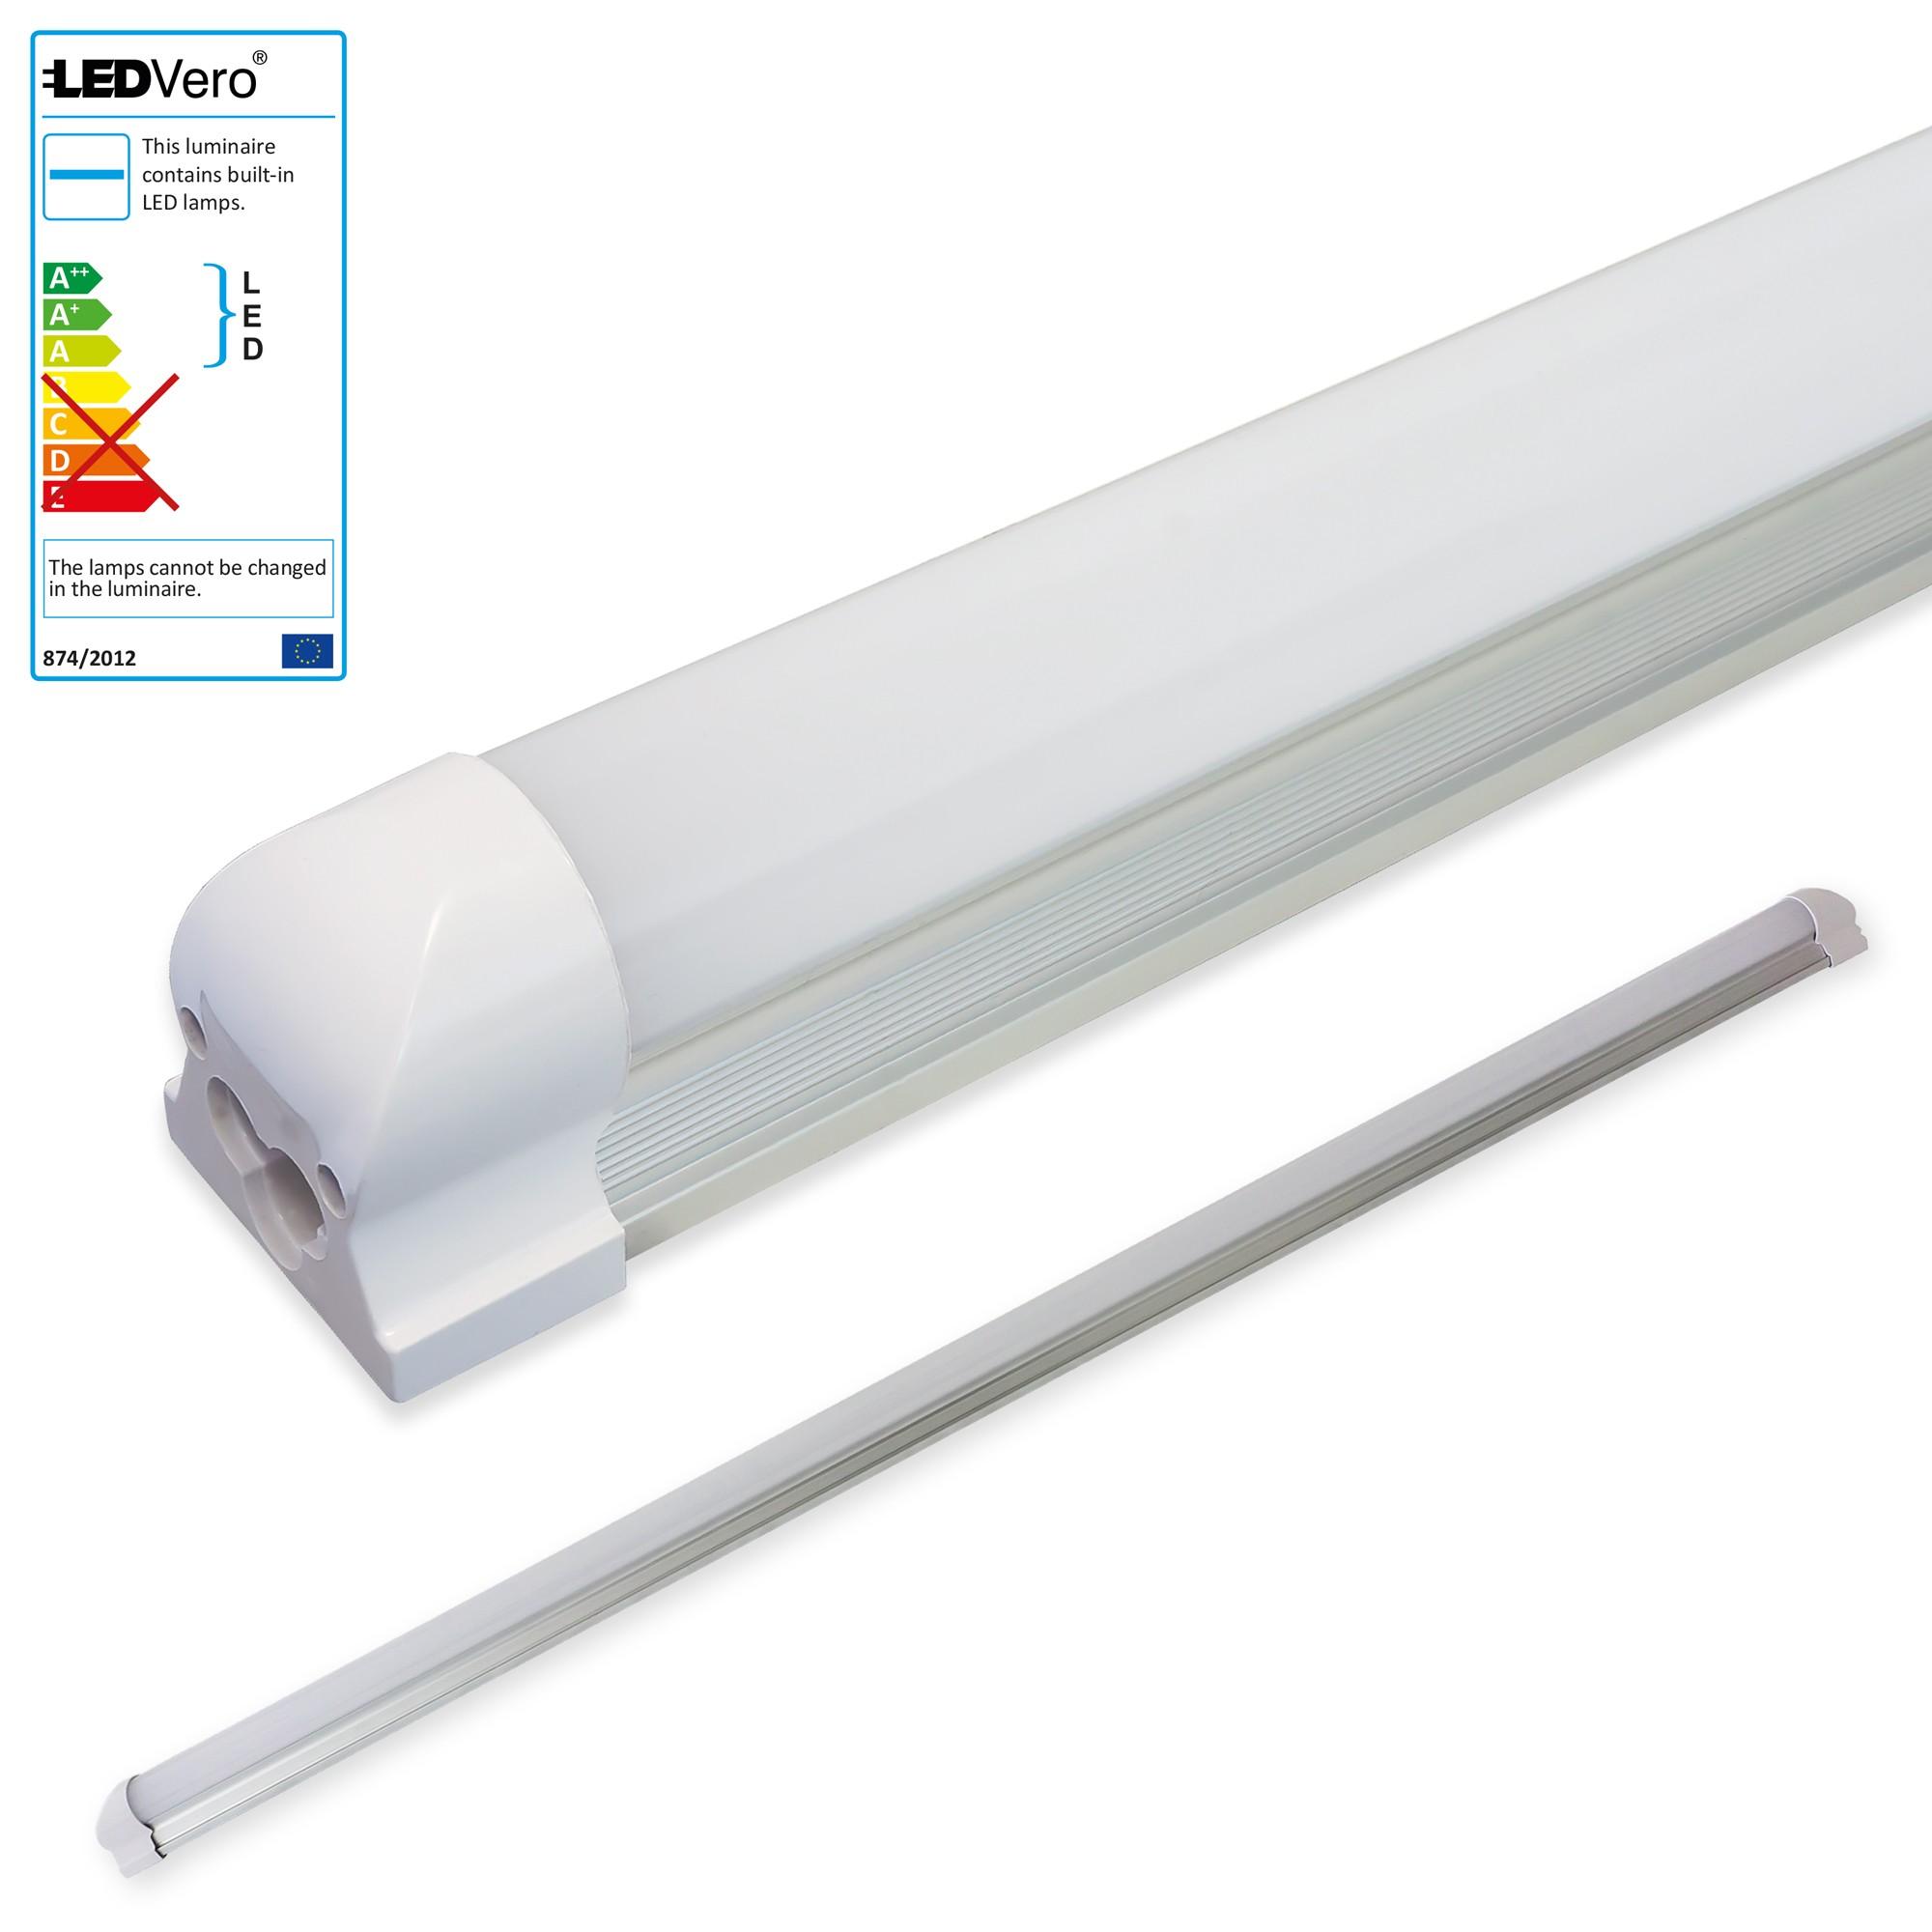 led r hre mit fassung 60 180cm r hren lichtleiste leuchtstoffr hre lampe tube ebay. Black Bedroom Furniture Sets. Home Design Ideas